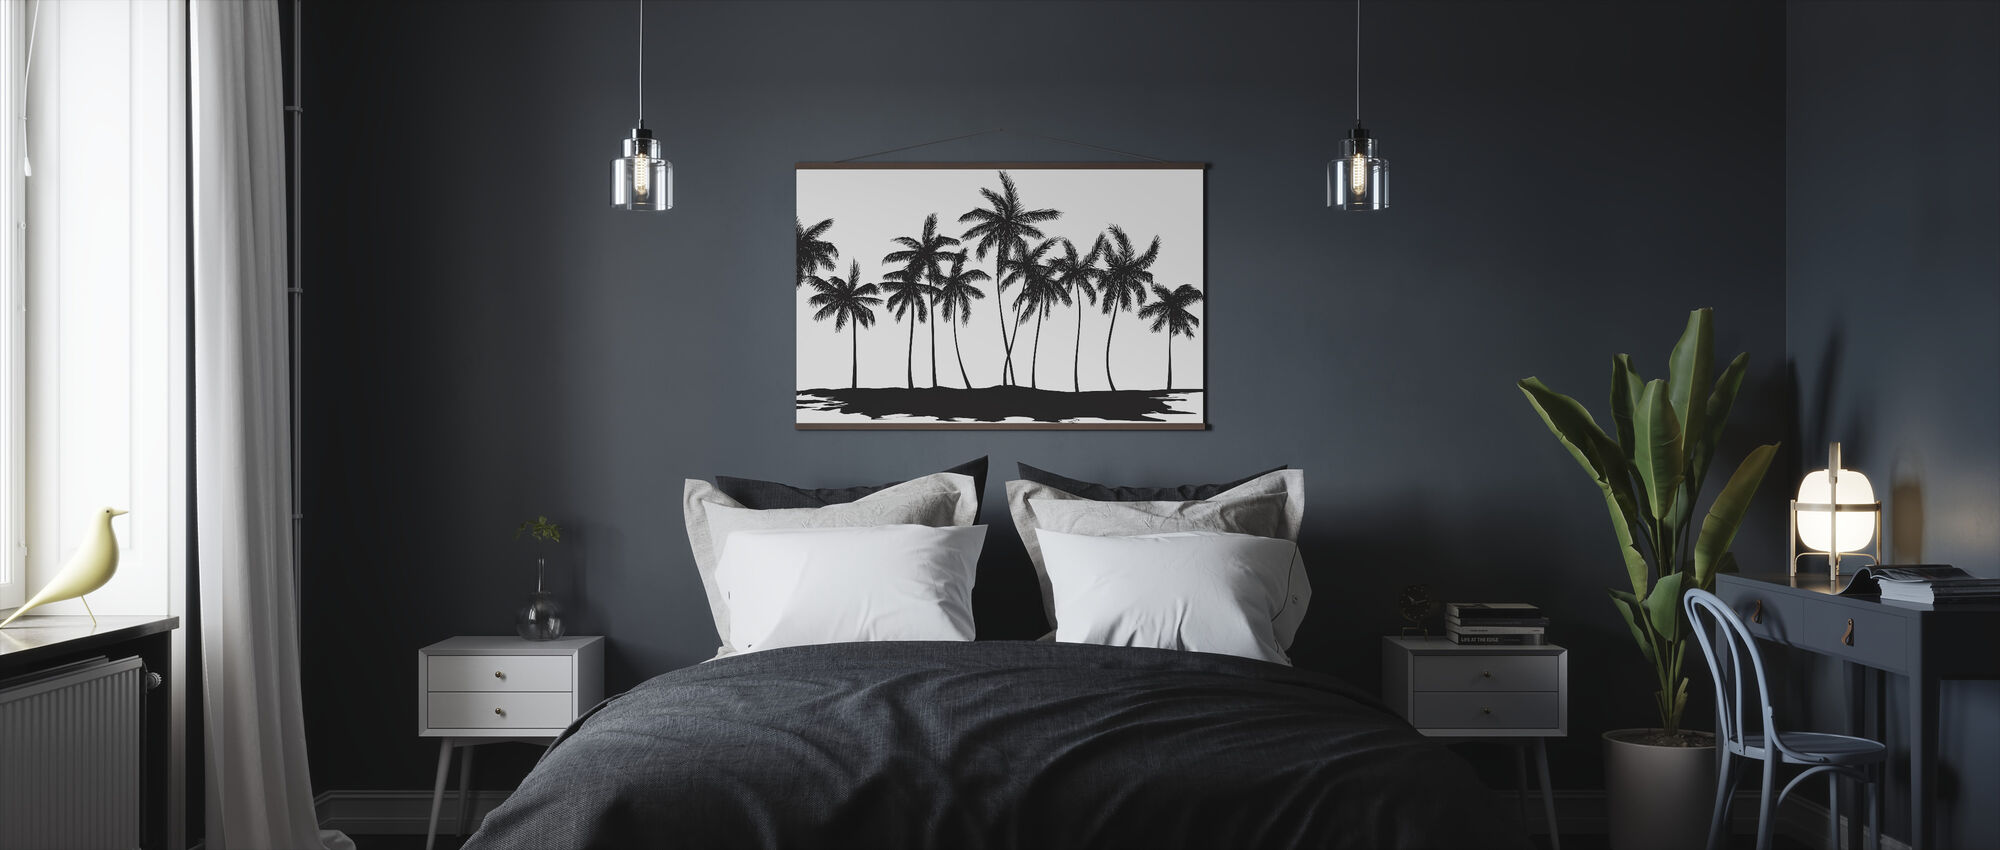 Palmen - Poster - Slaapkamer